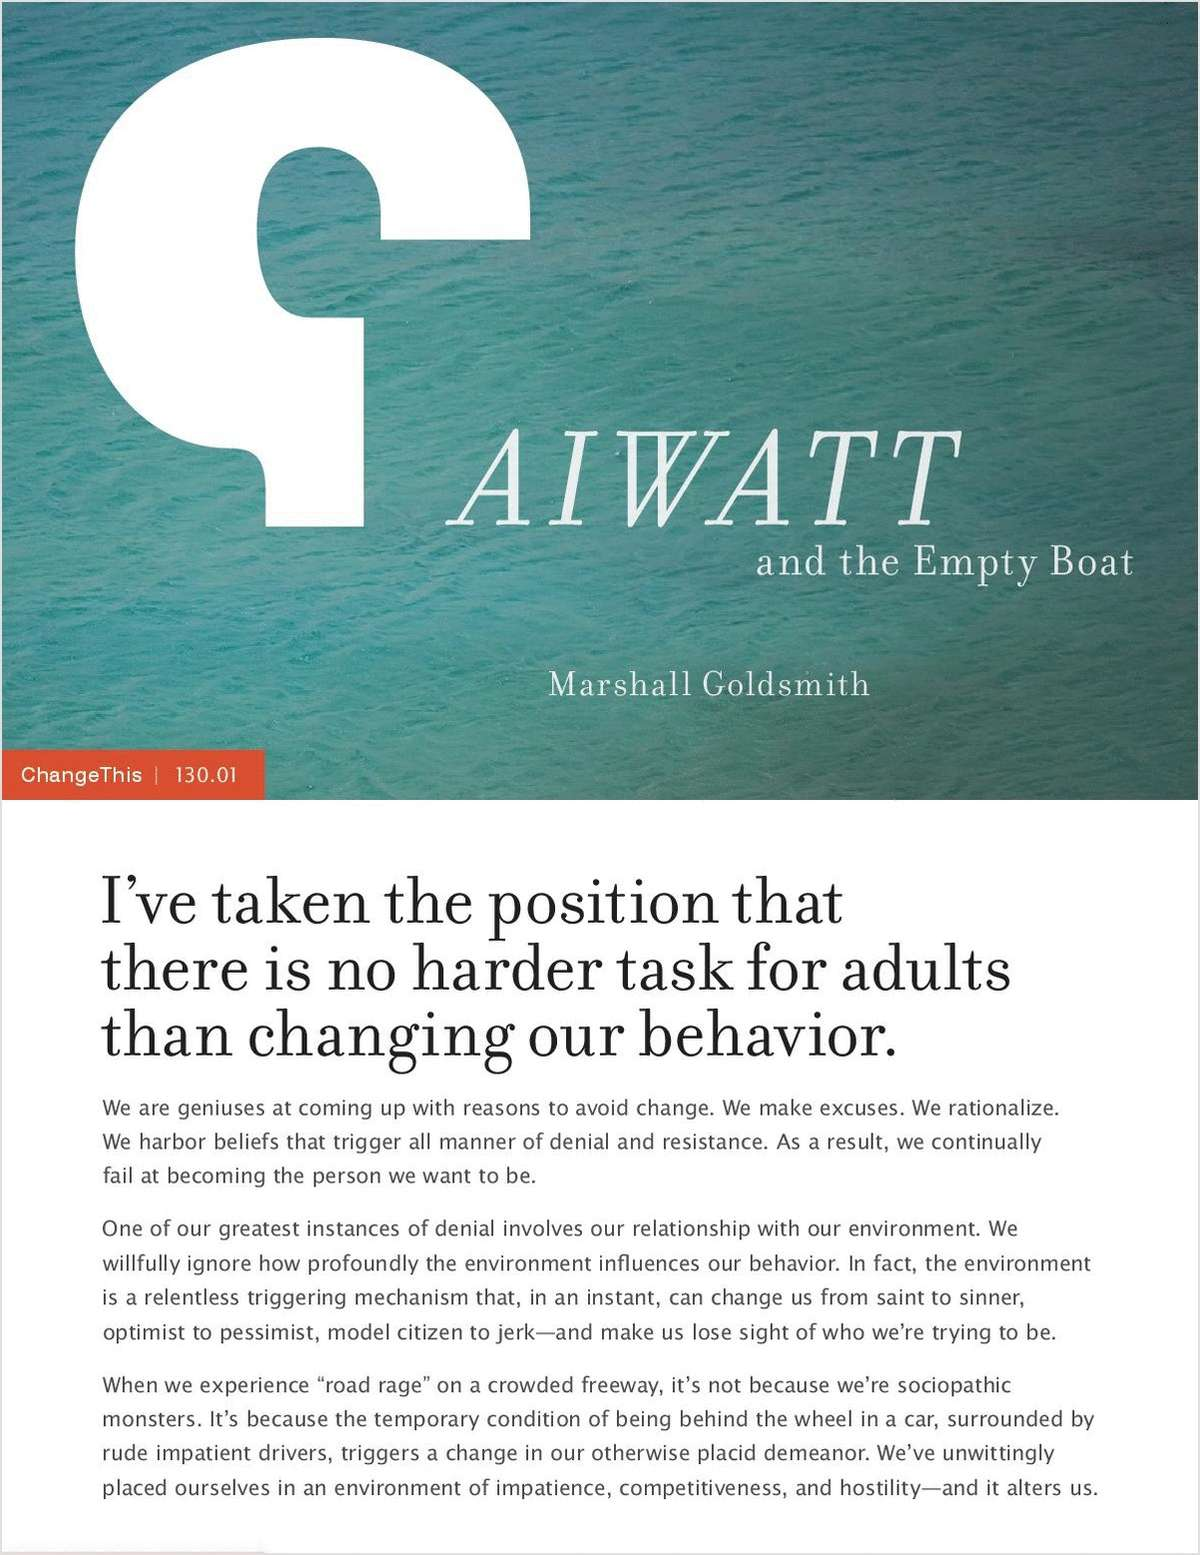 Creating Behavior That Lasts: Using the AIWATT Method